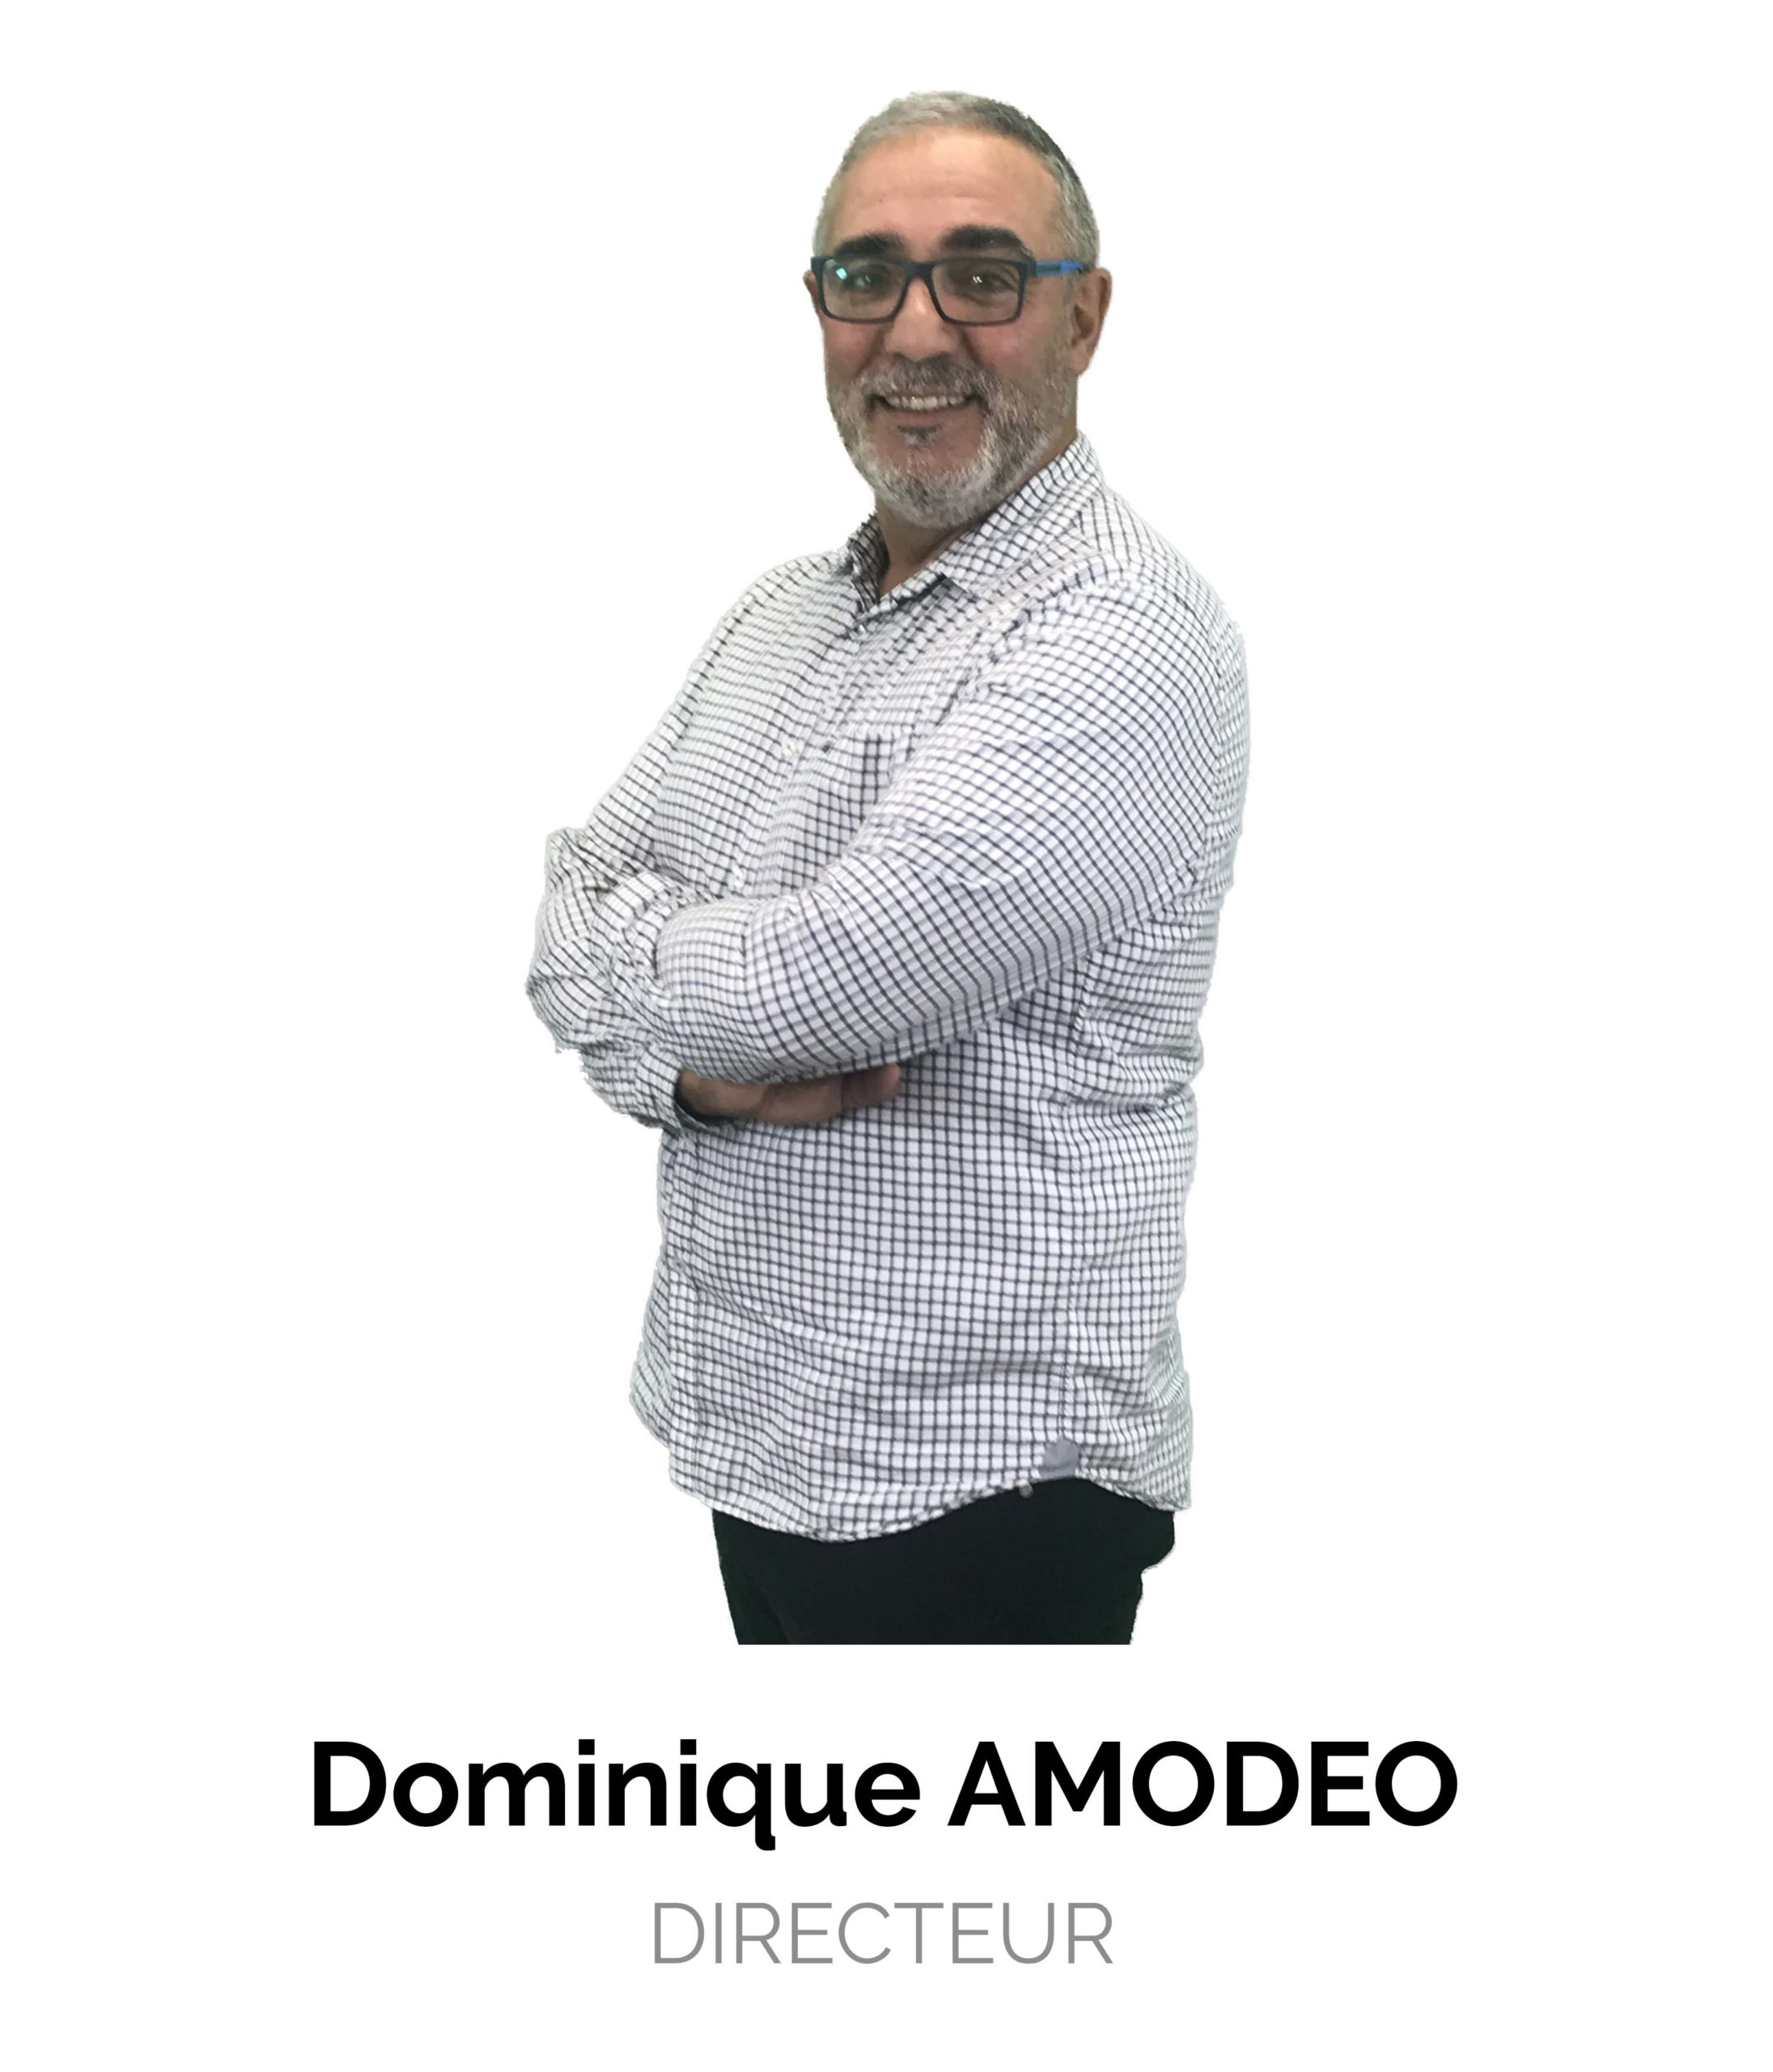 Dominique Amodeo Directeur